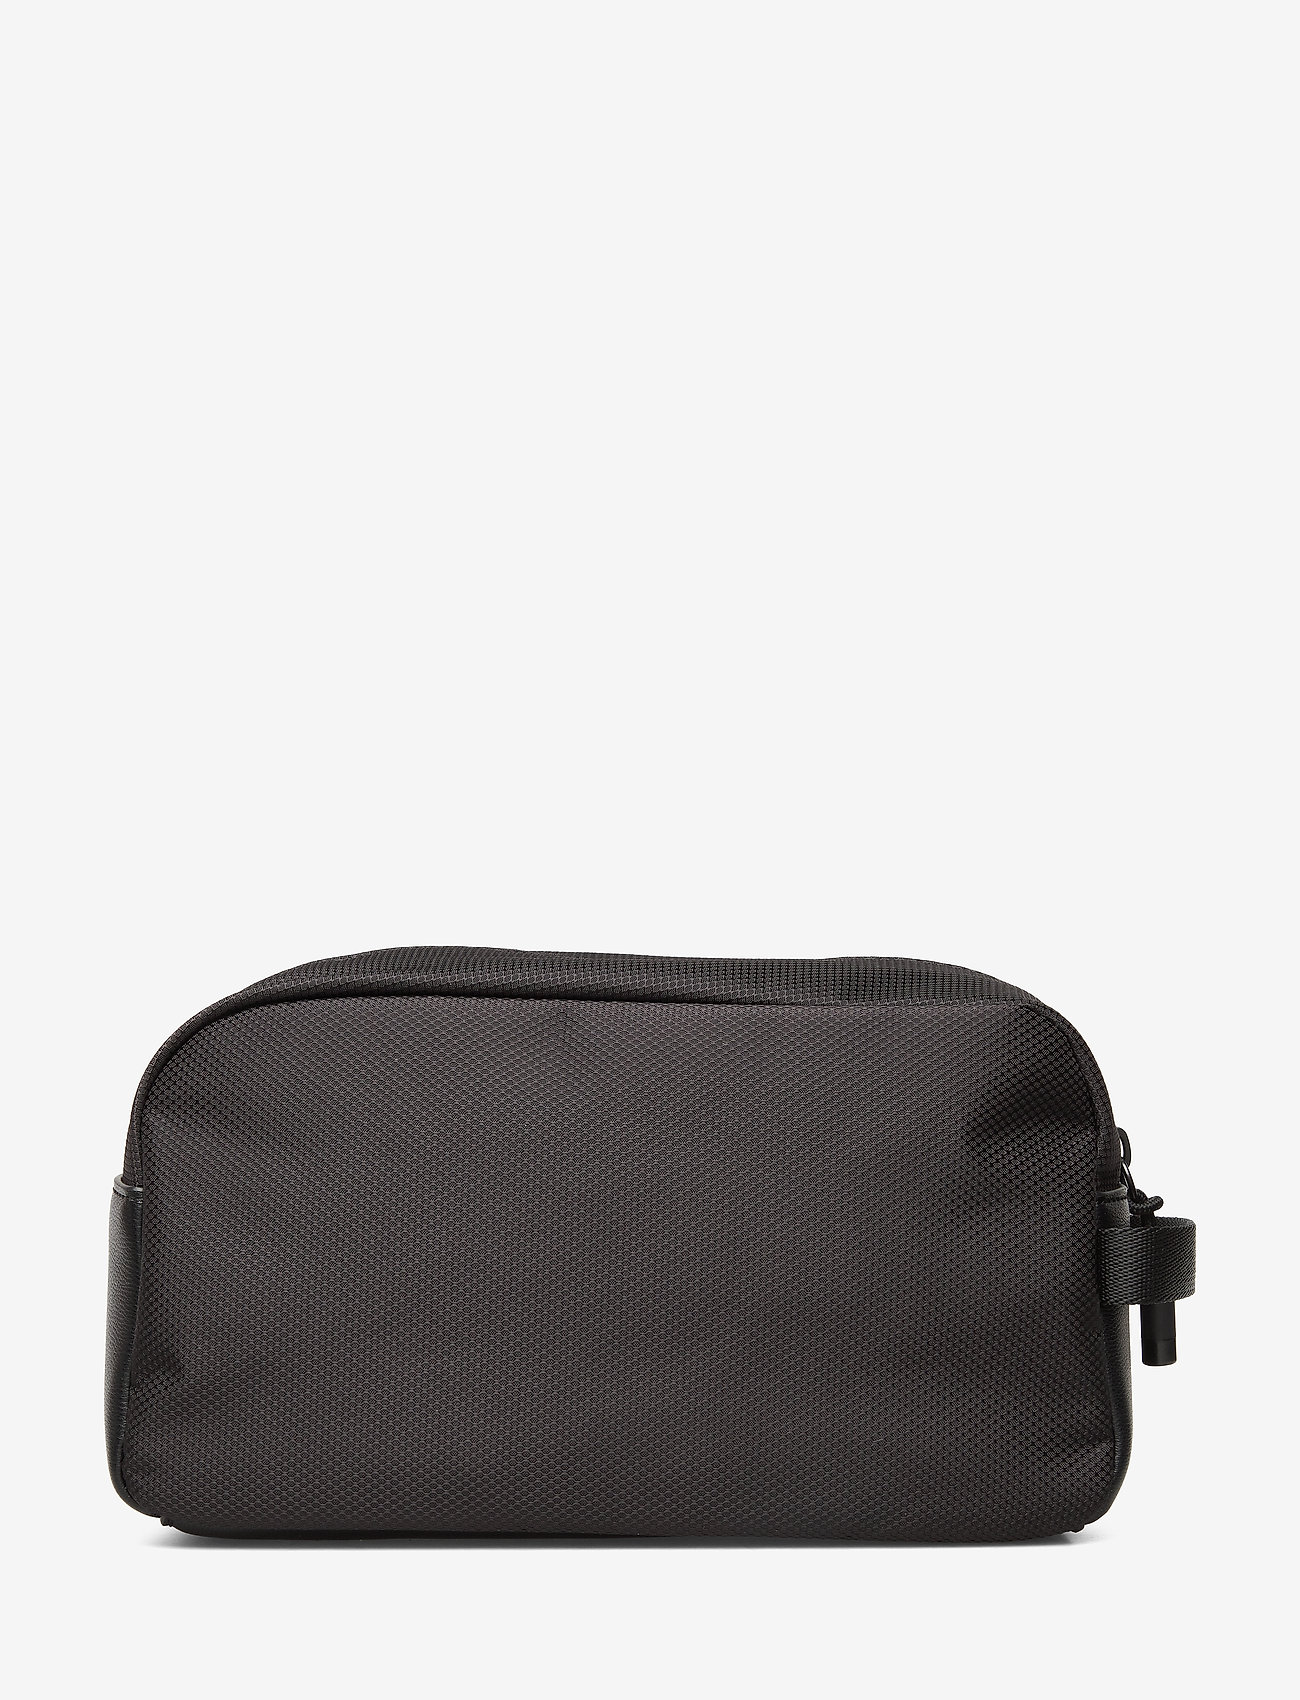 Calvin Klein Ck Pro Washbag - Bags